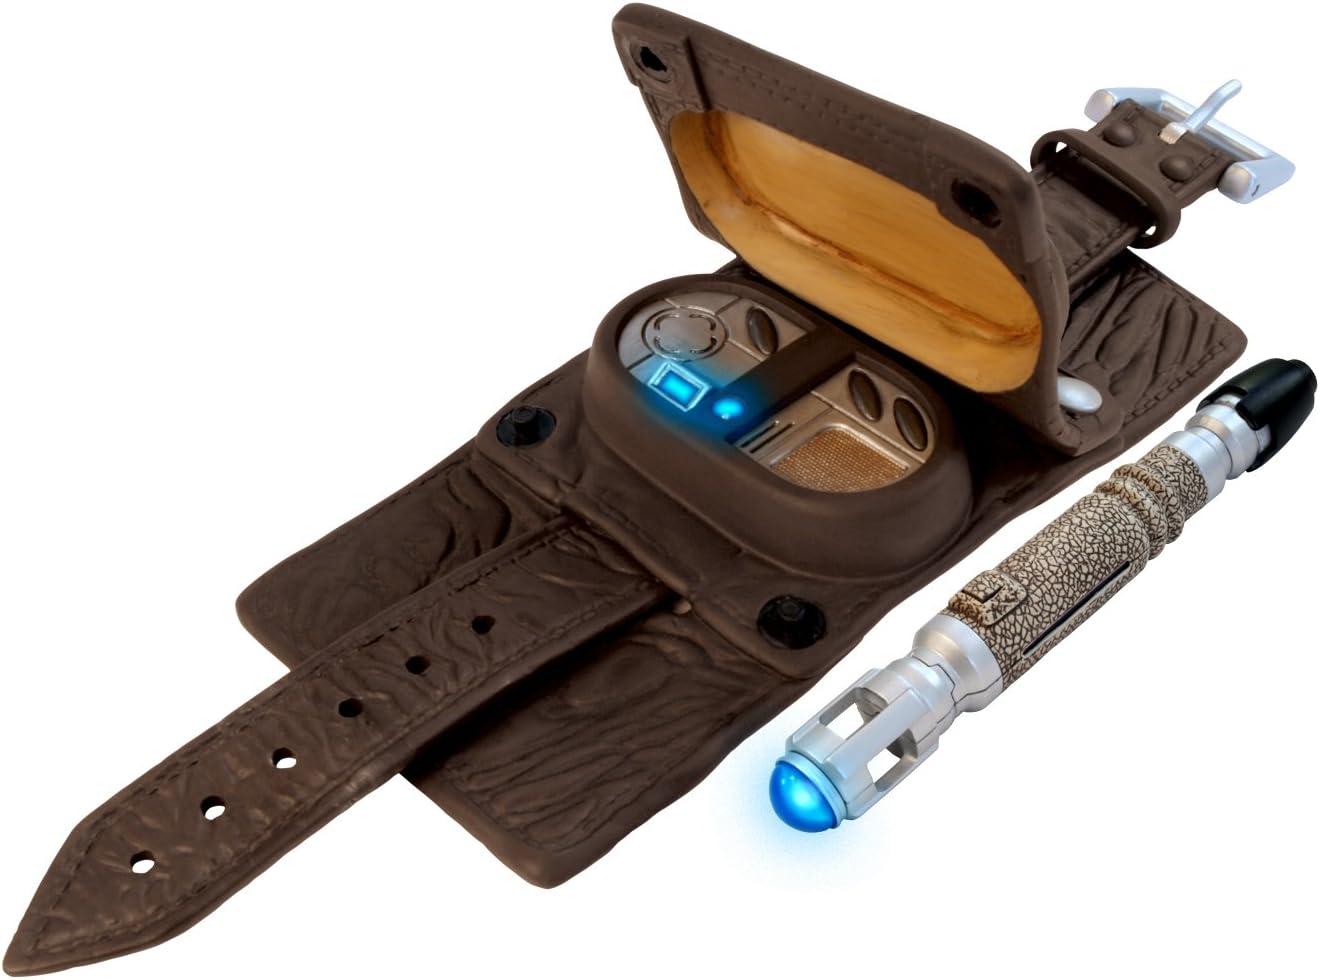 Doctor Who Vortex Manipulator and Sonic Screwdriver by Underground Toys